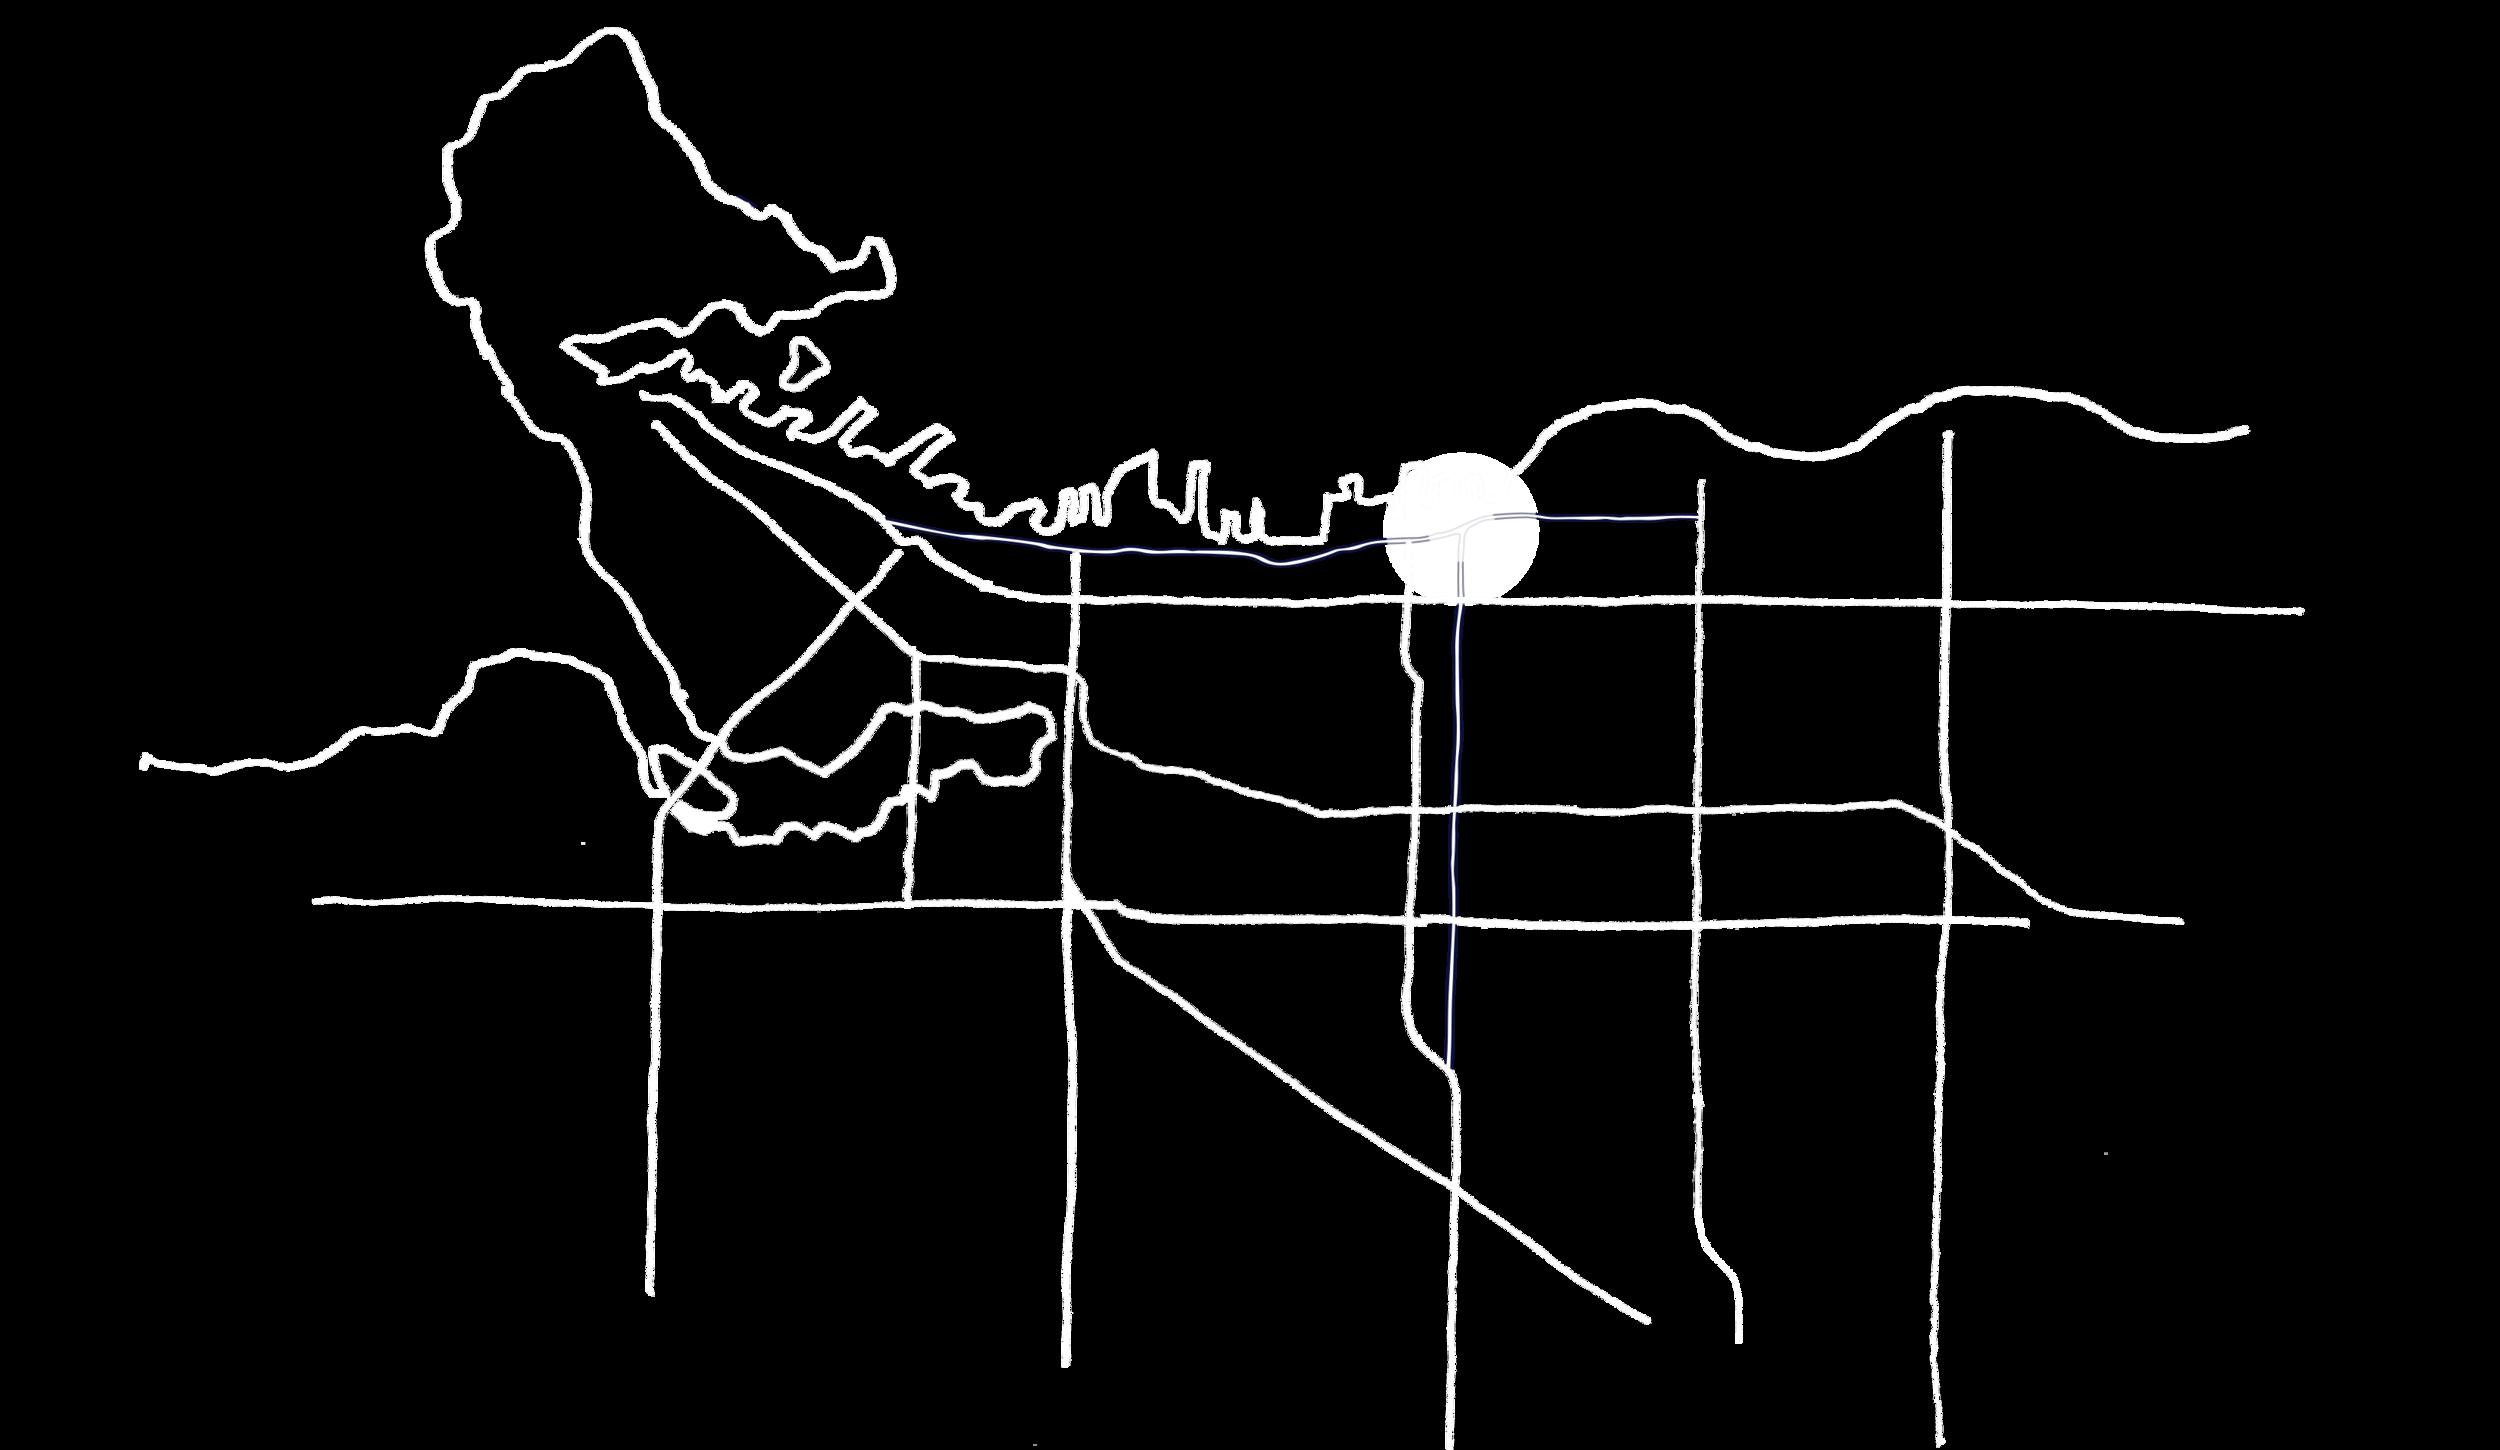 VancouverMap.png